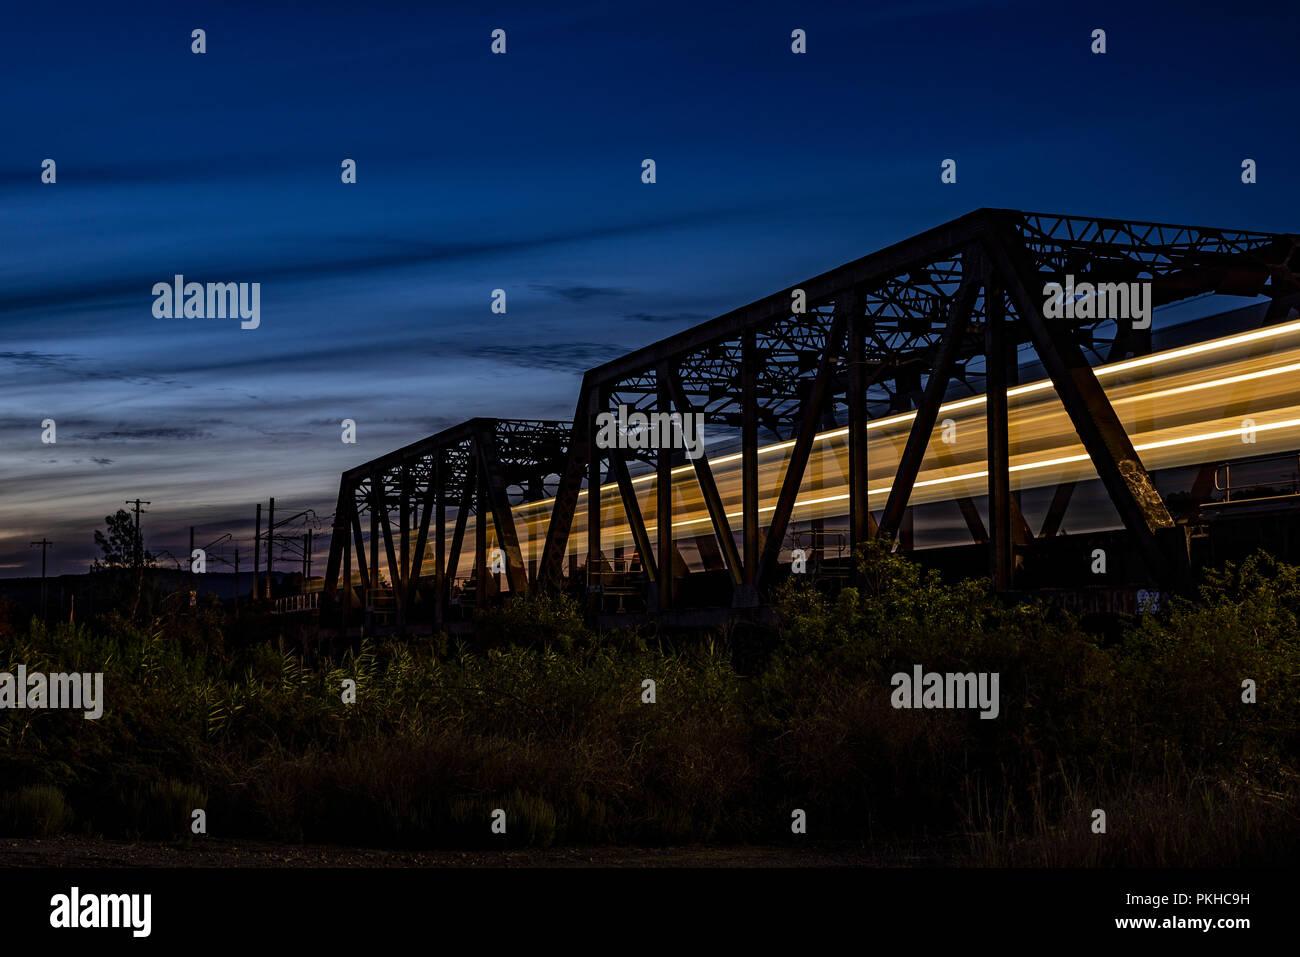 Newcastle australia - Stock Image